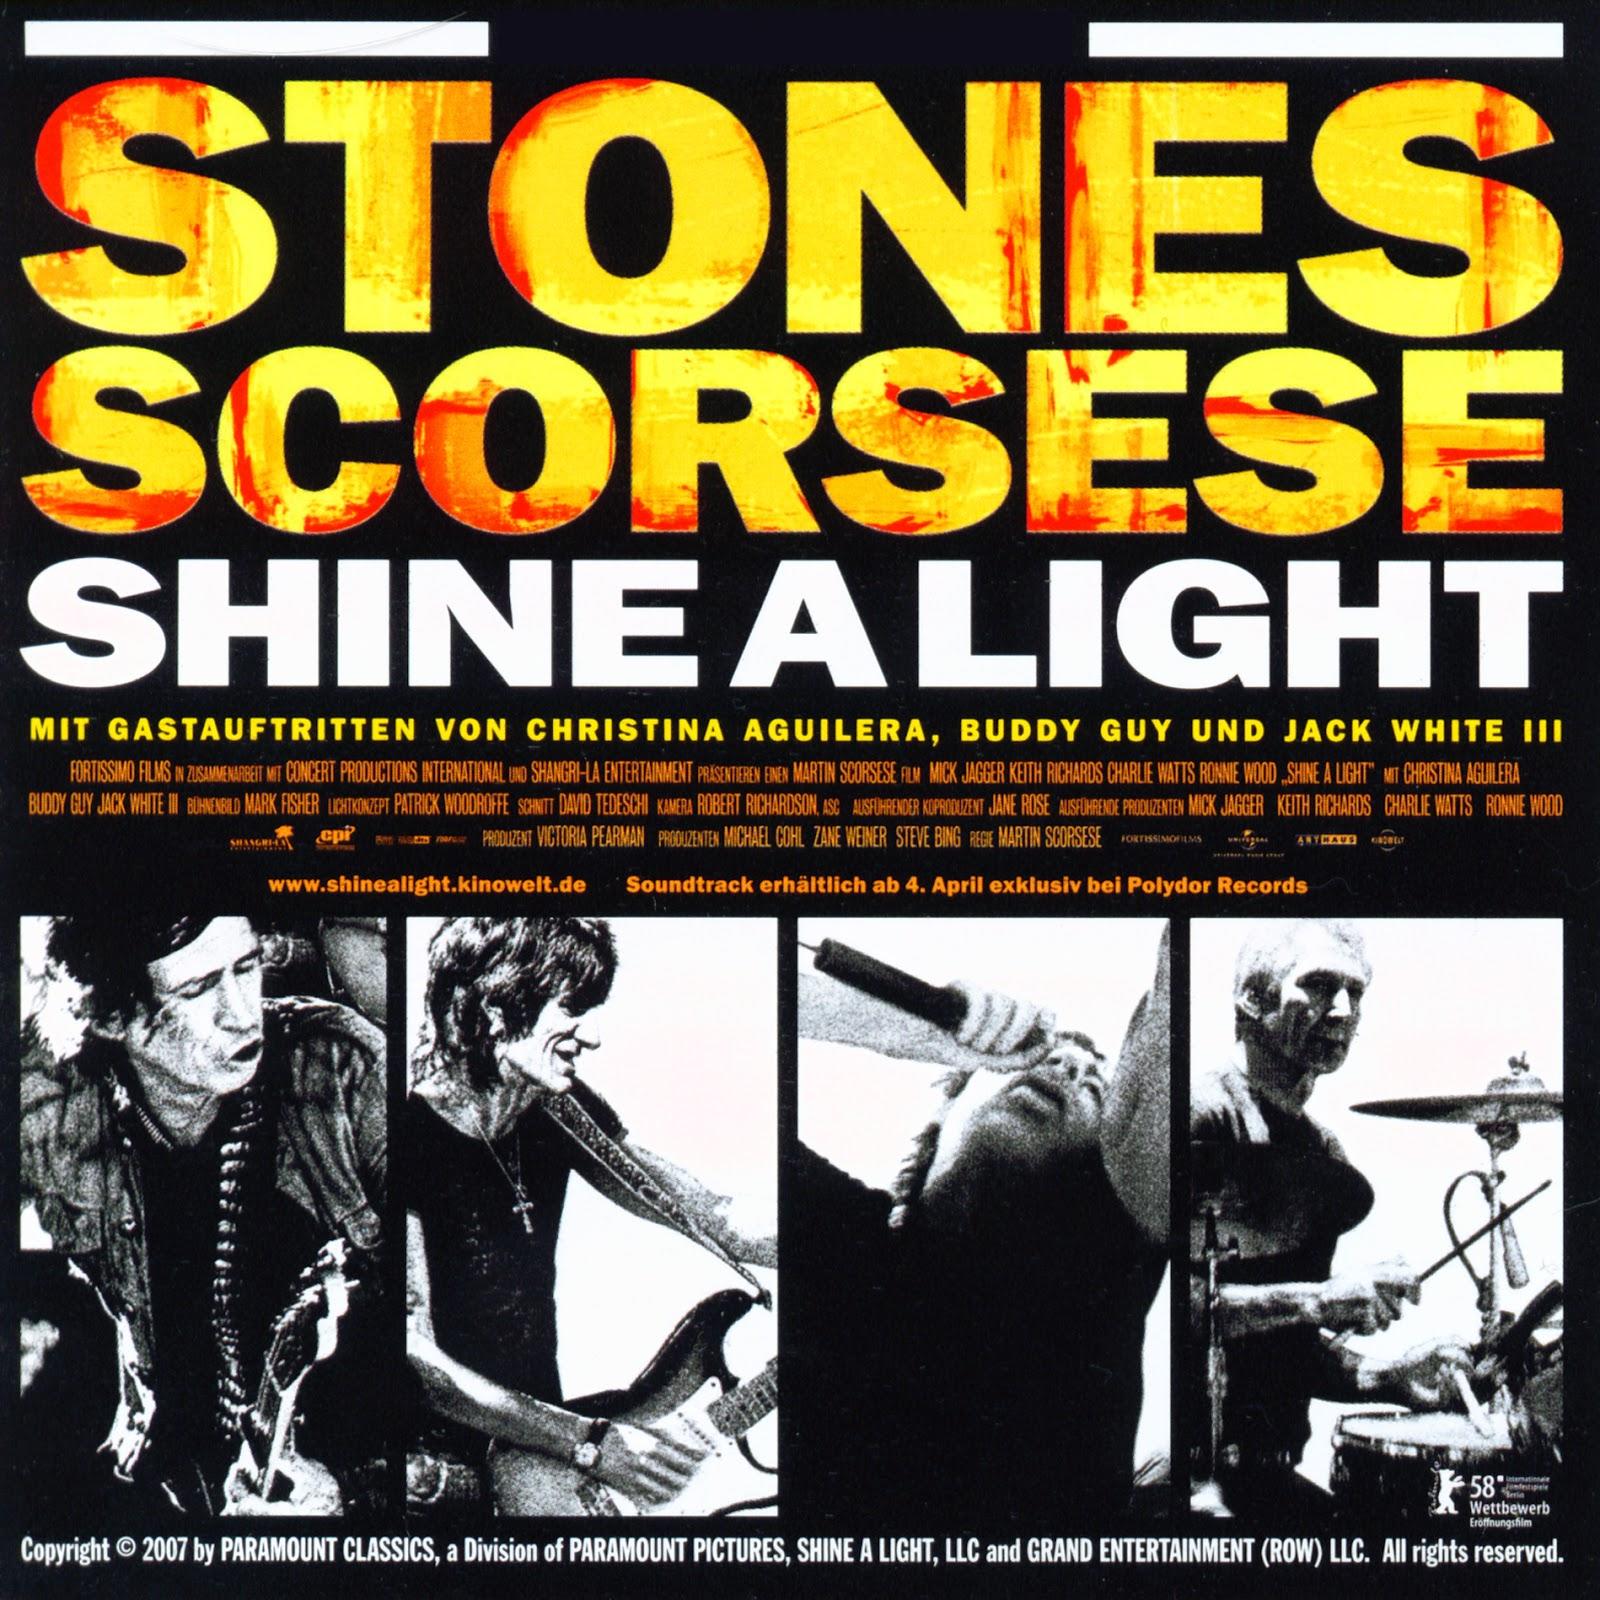 Rolling Stones - Shine a Light (film) 2008 - CALLE NOSTALGIA